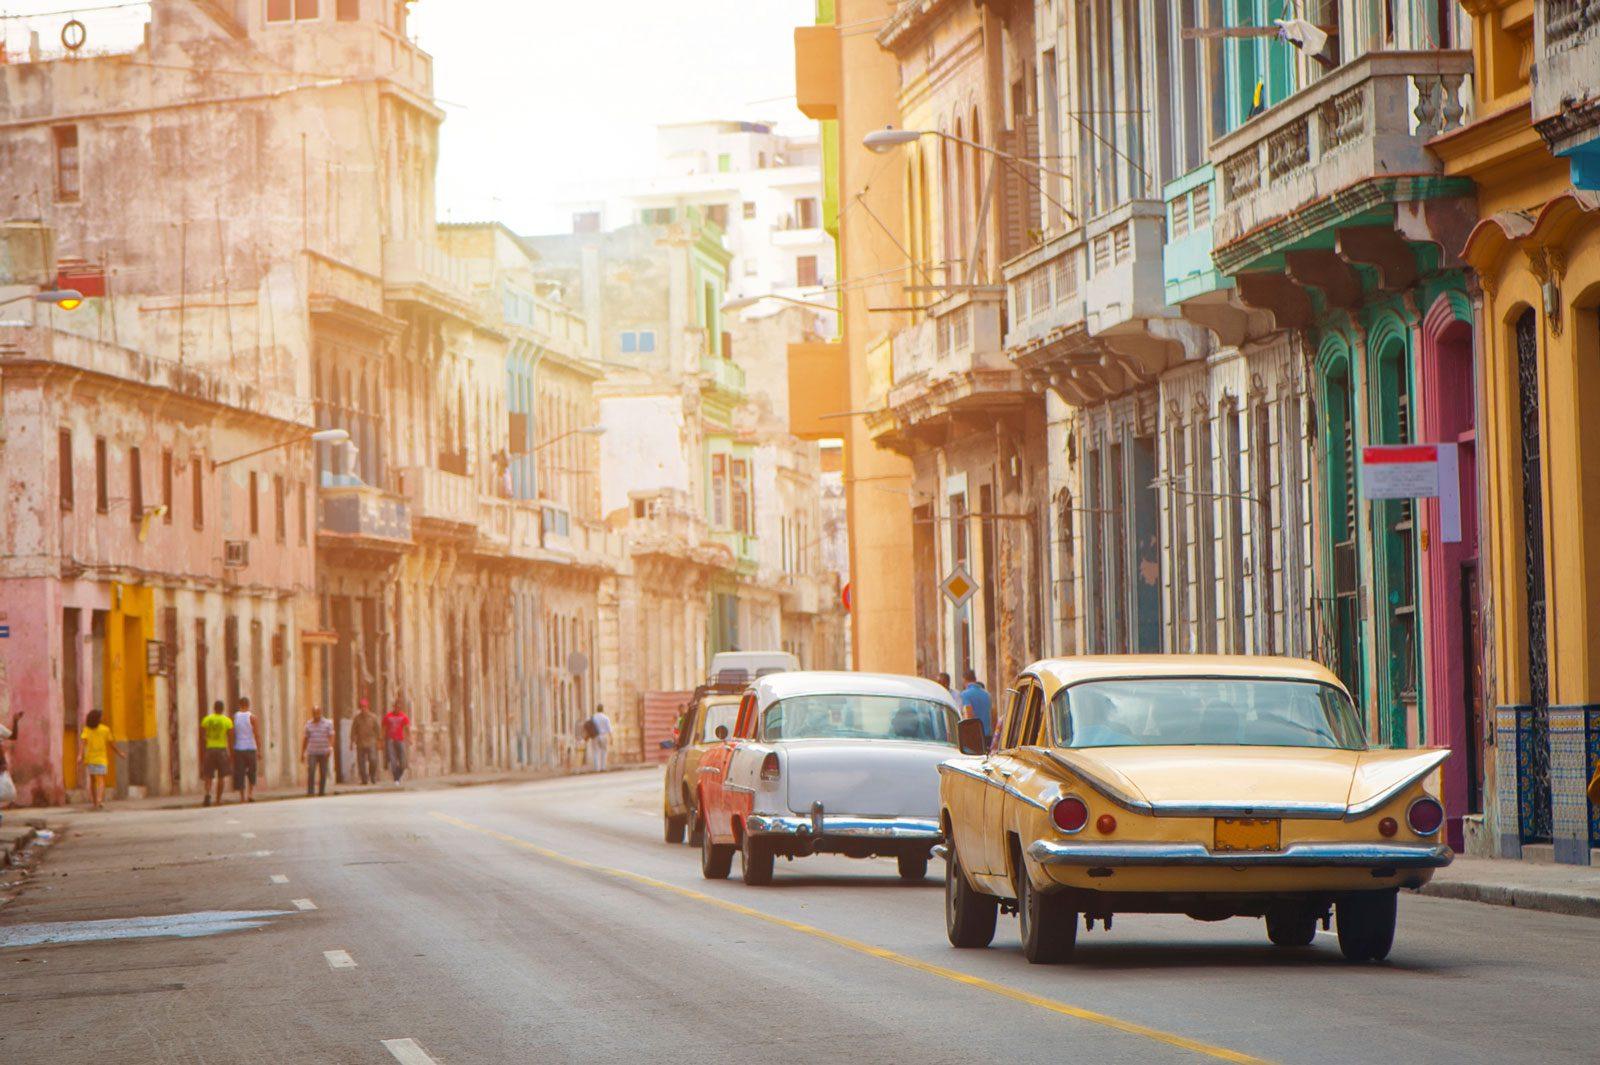 Cuba (Photo: Cuba.com)